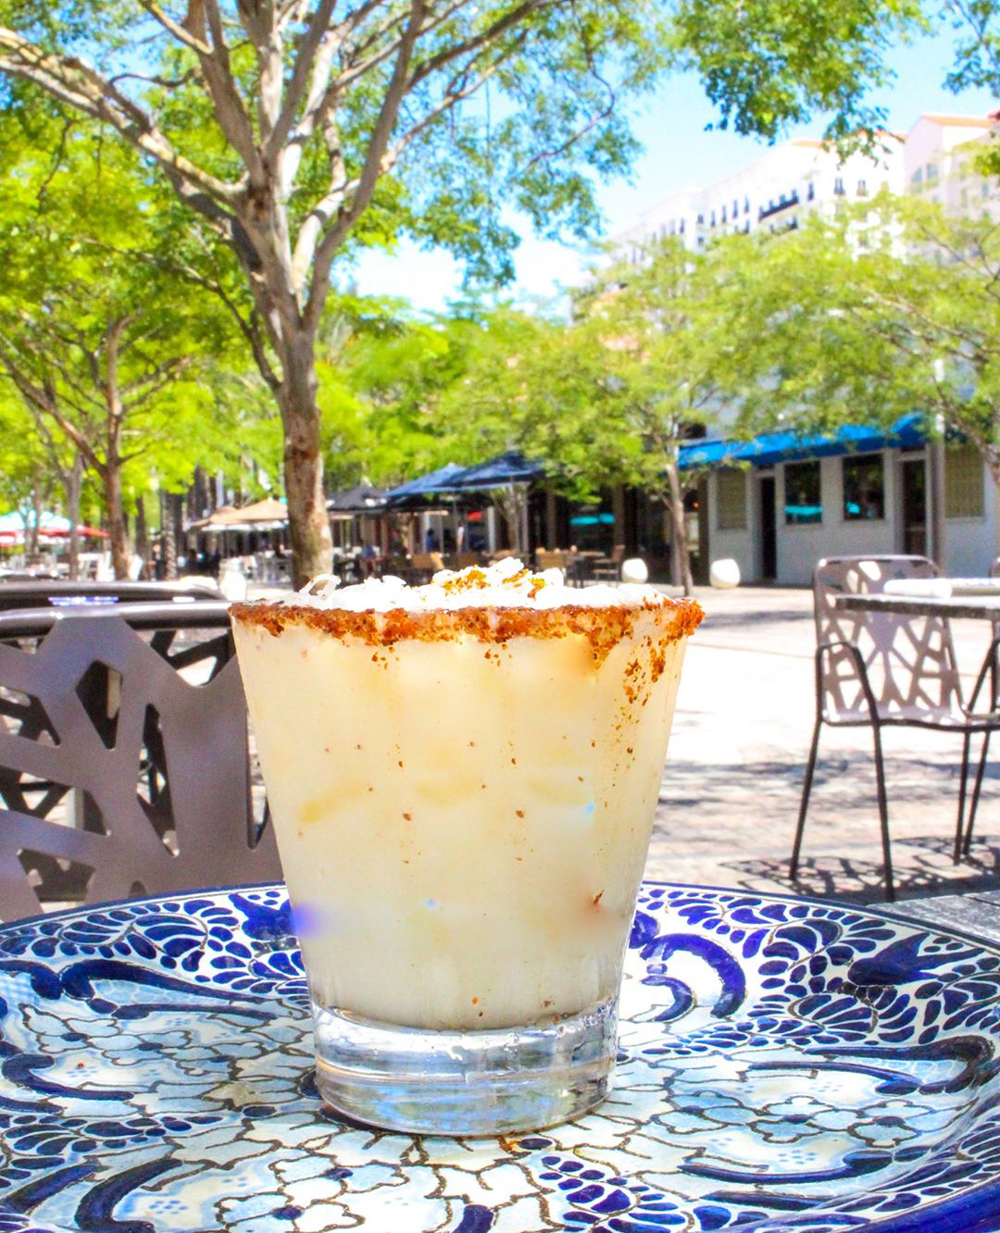 Miami Cocktails Coconut Margarita to go at Cocina Talavera restaurant in Coral Gables